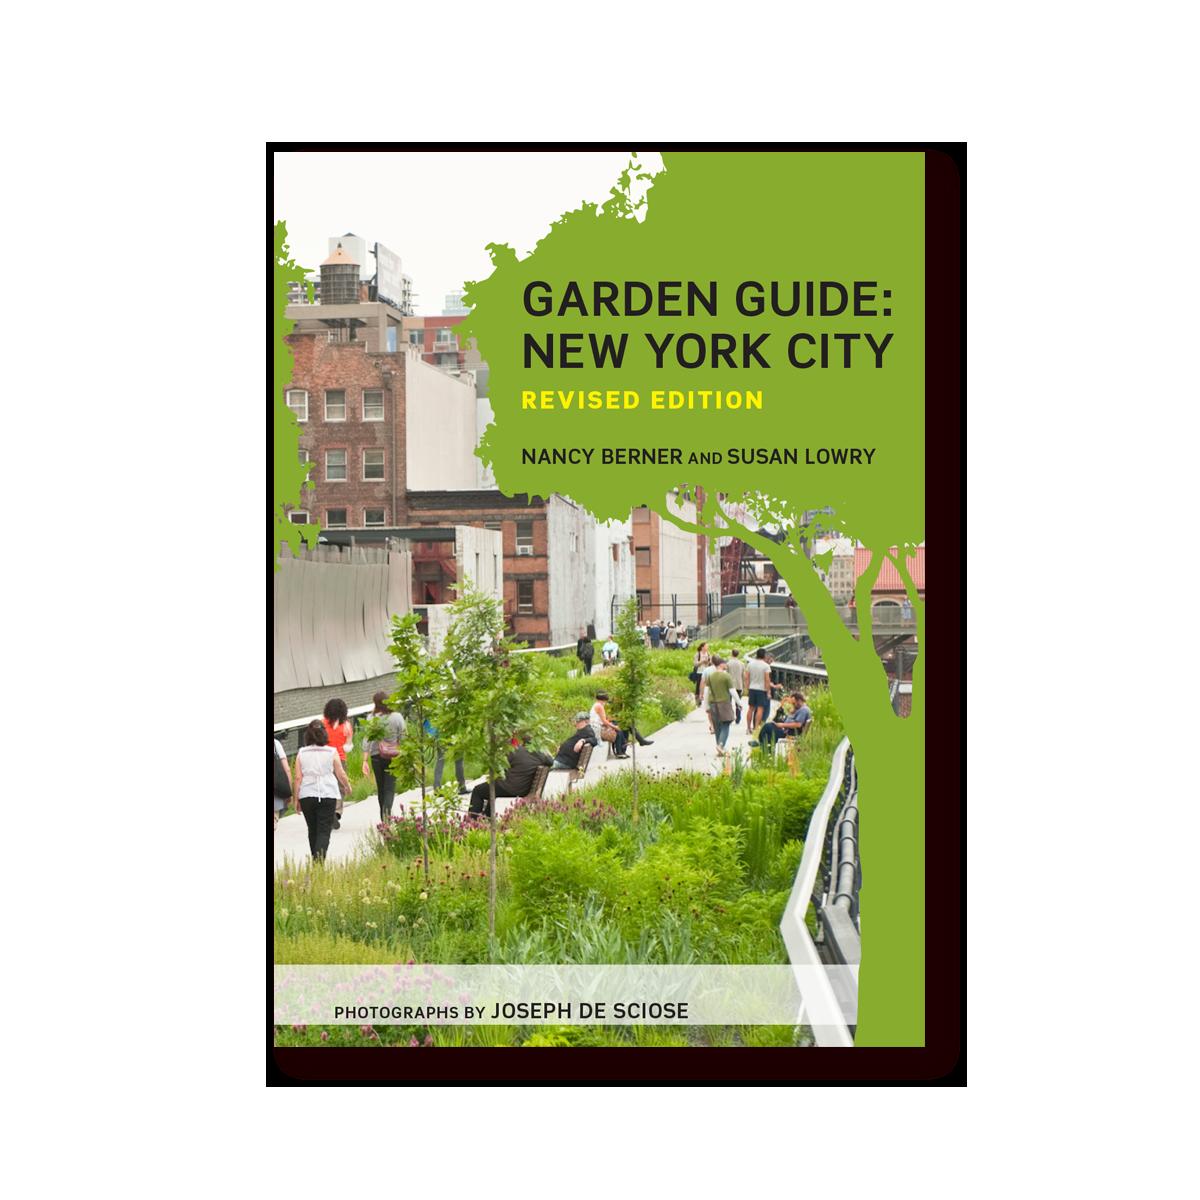 GardenGuide_Cvr.png